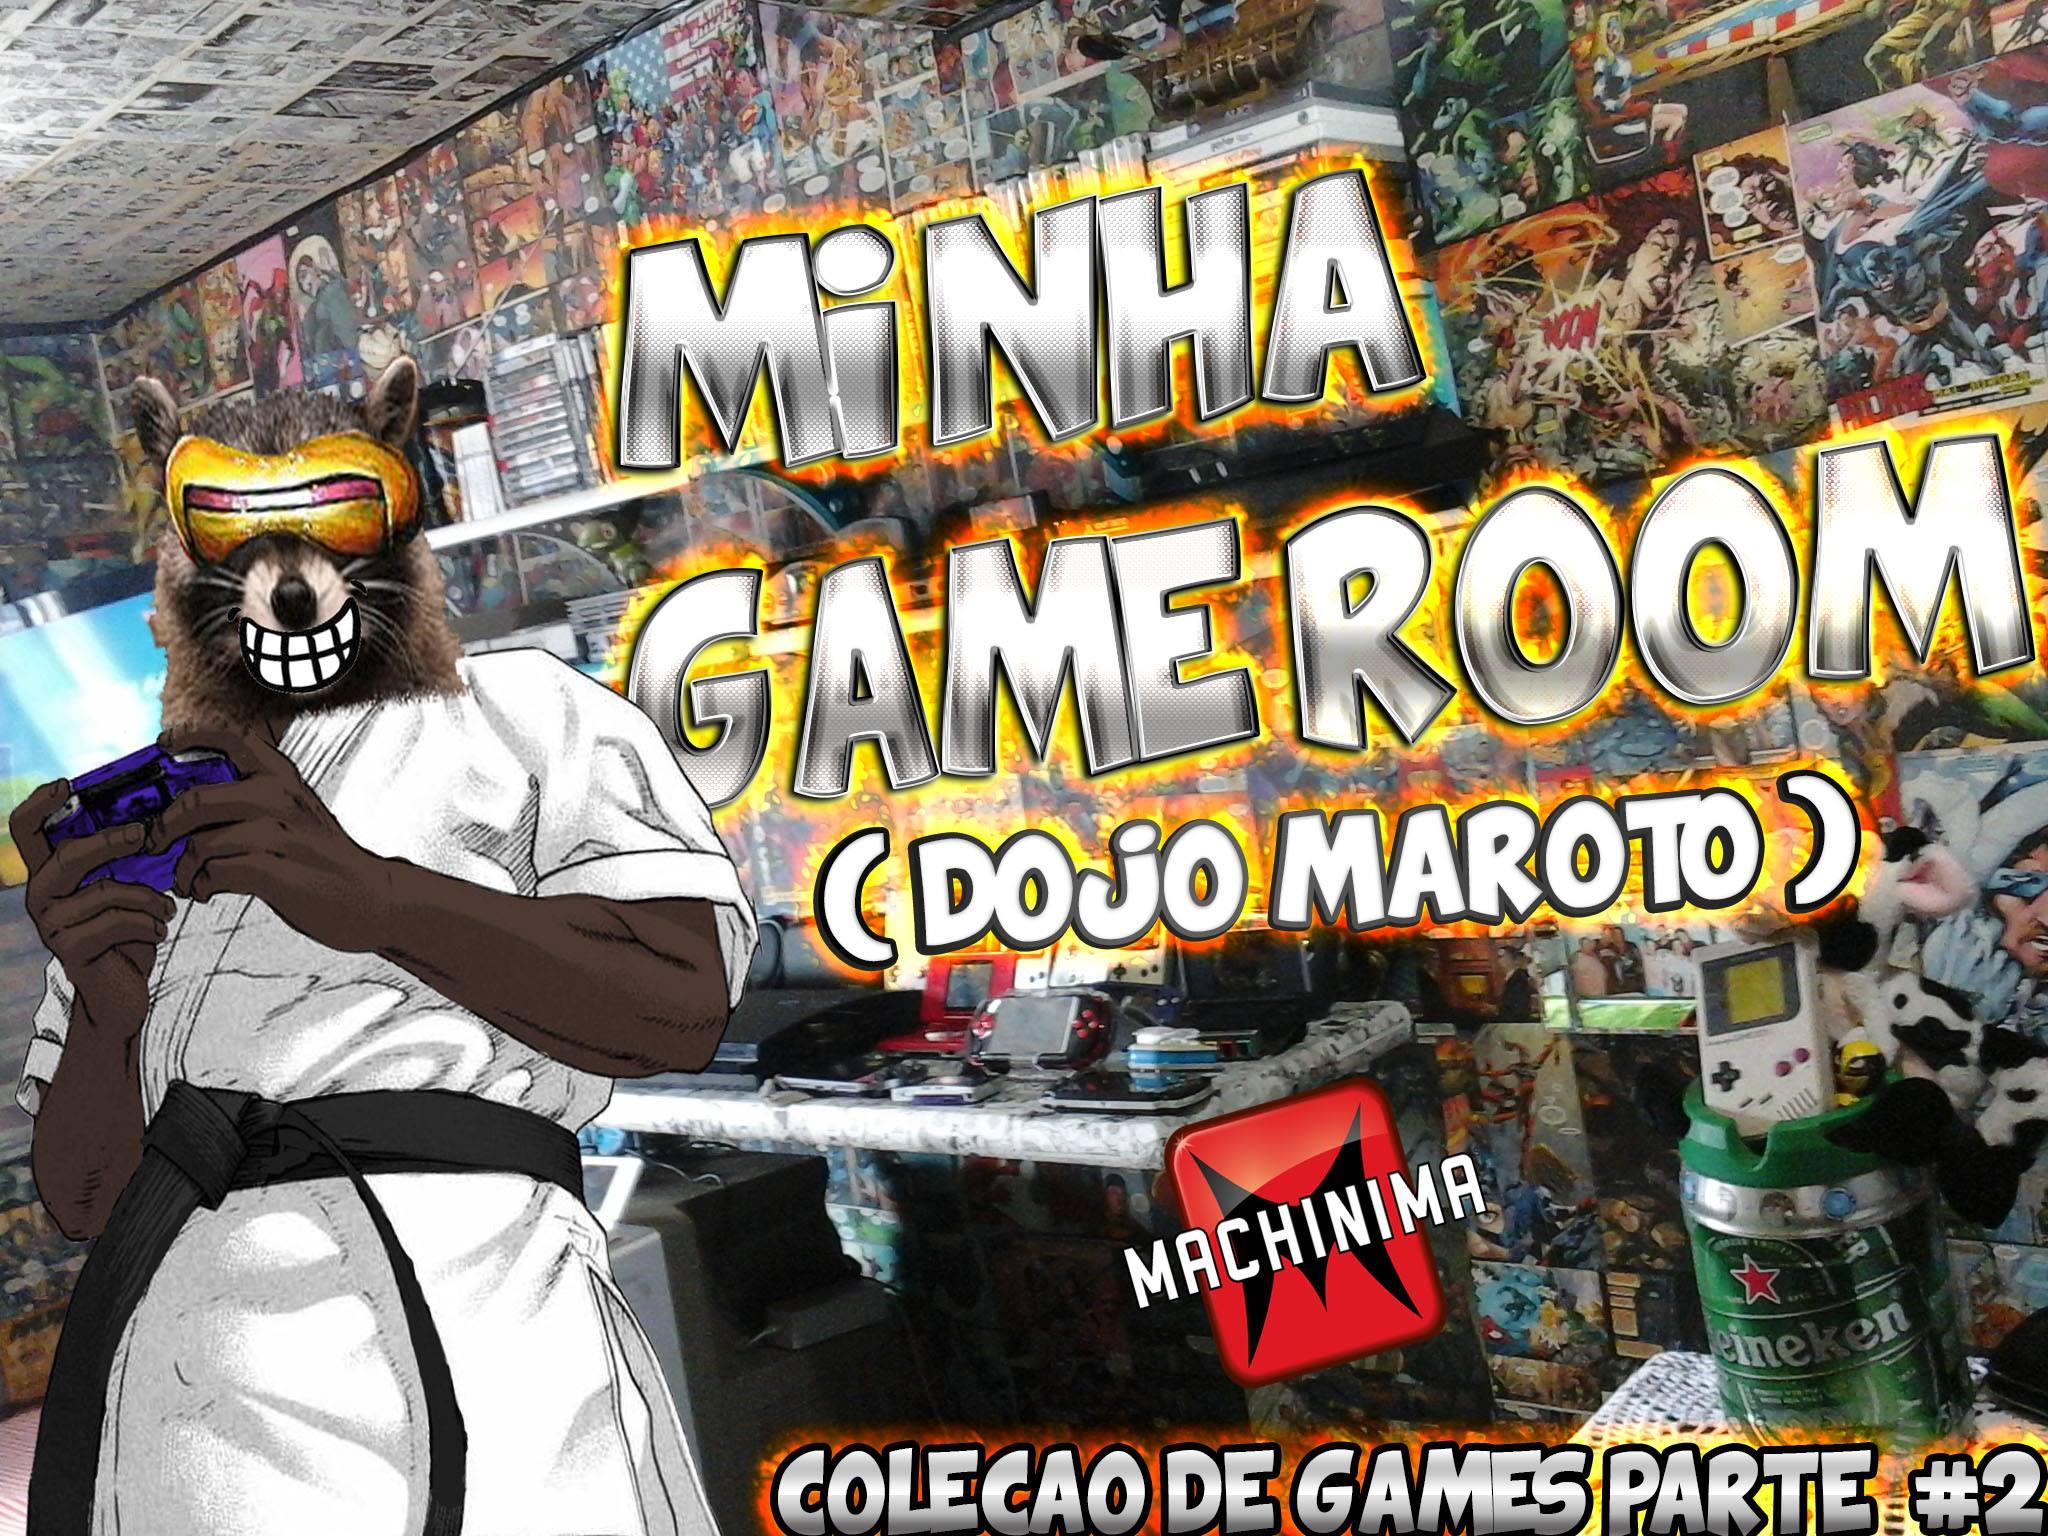 Guaxinim Maroto - Gameroom - Img